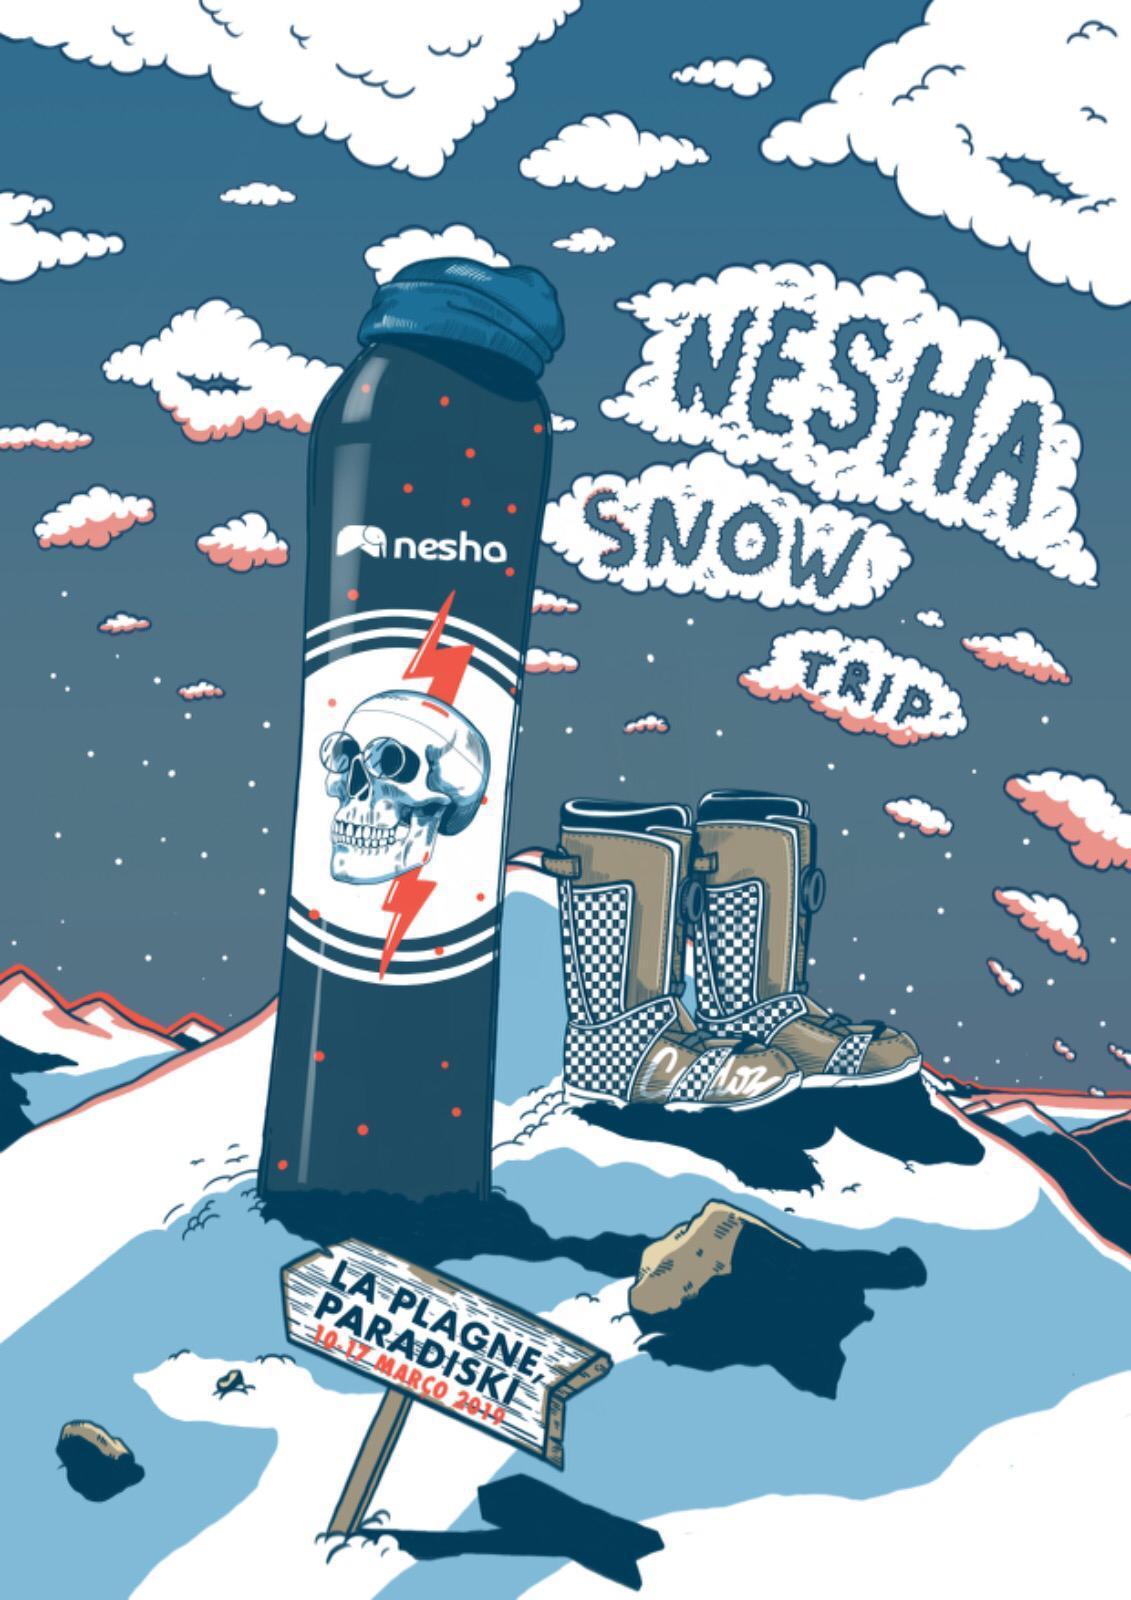 nesha snow trip 2019